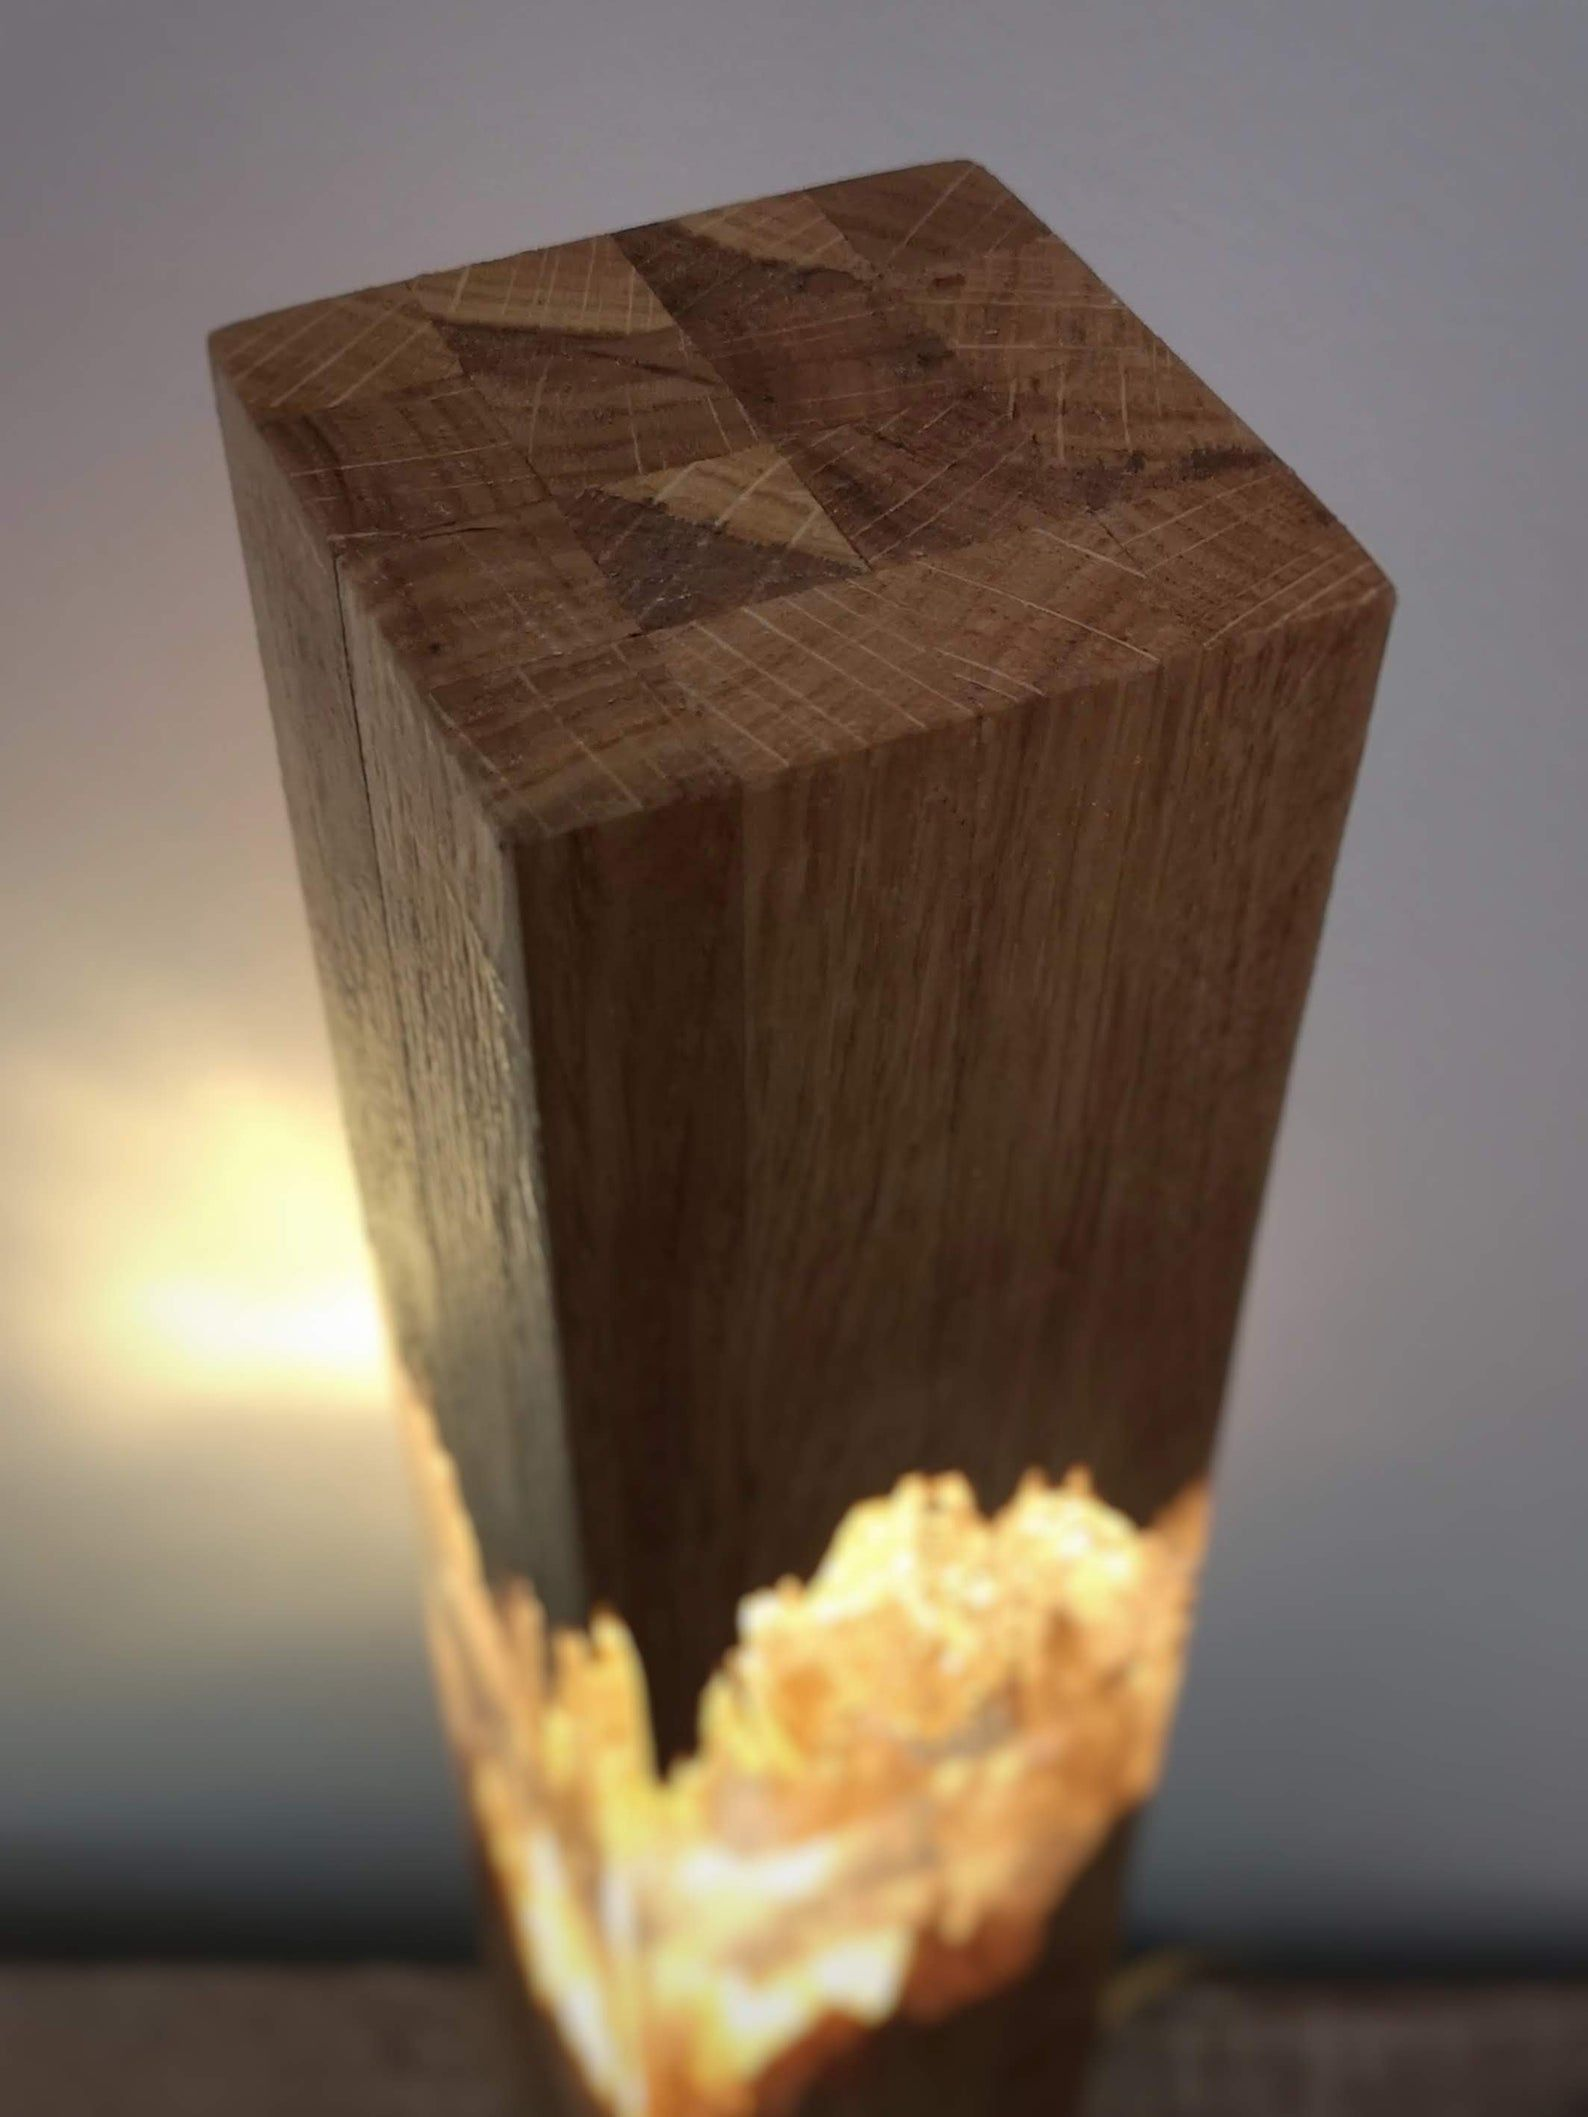 Epoxy Wood Lamp Lamp Night Lamp Resin Table Decor Decor Light In 2020 Resin Table Wood Lamps Wood Lamp Design